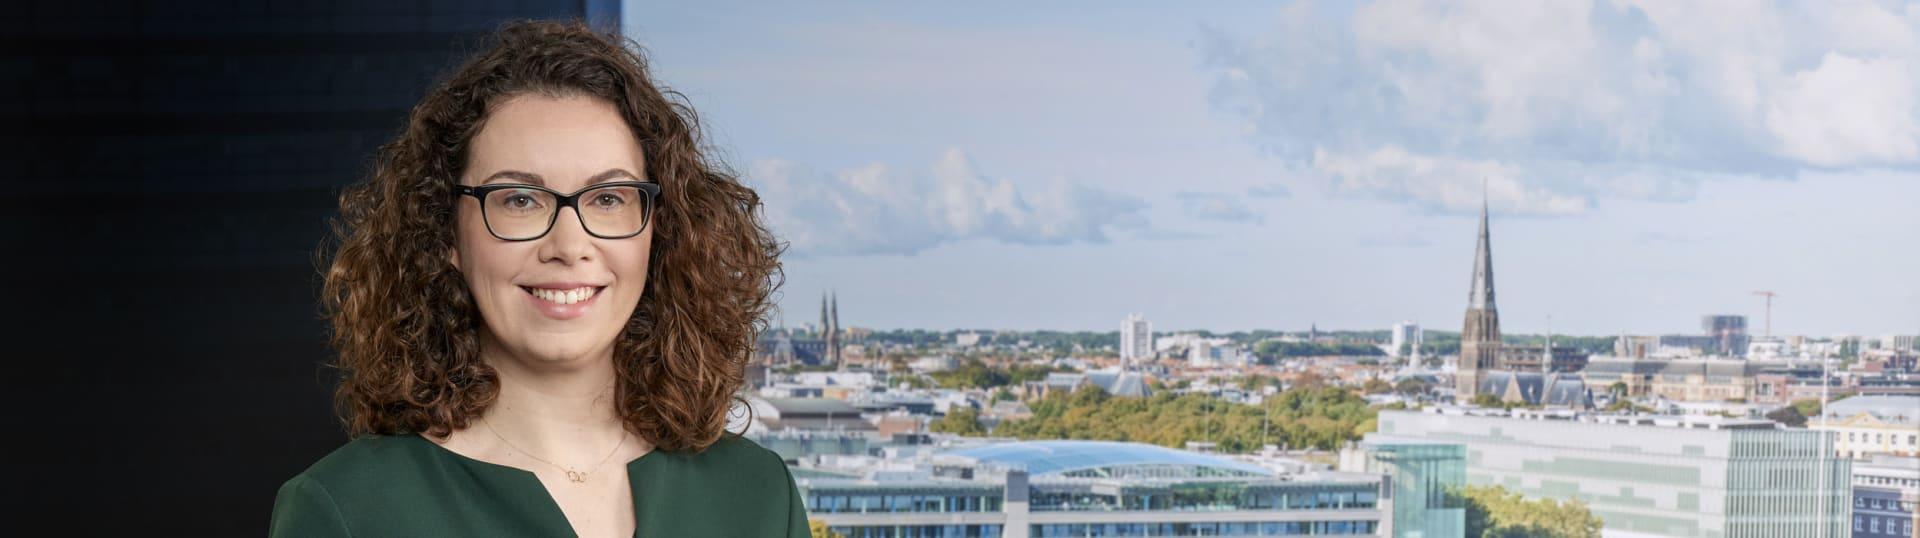 Maartje Mohring, advocaat Pels Rijcken